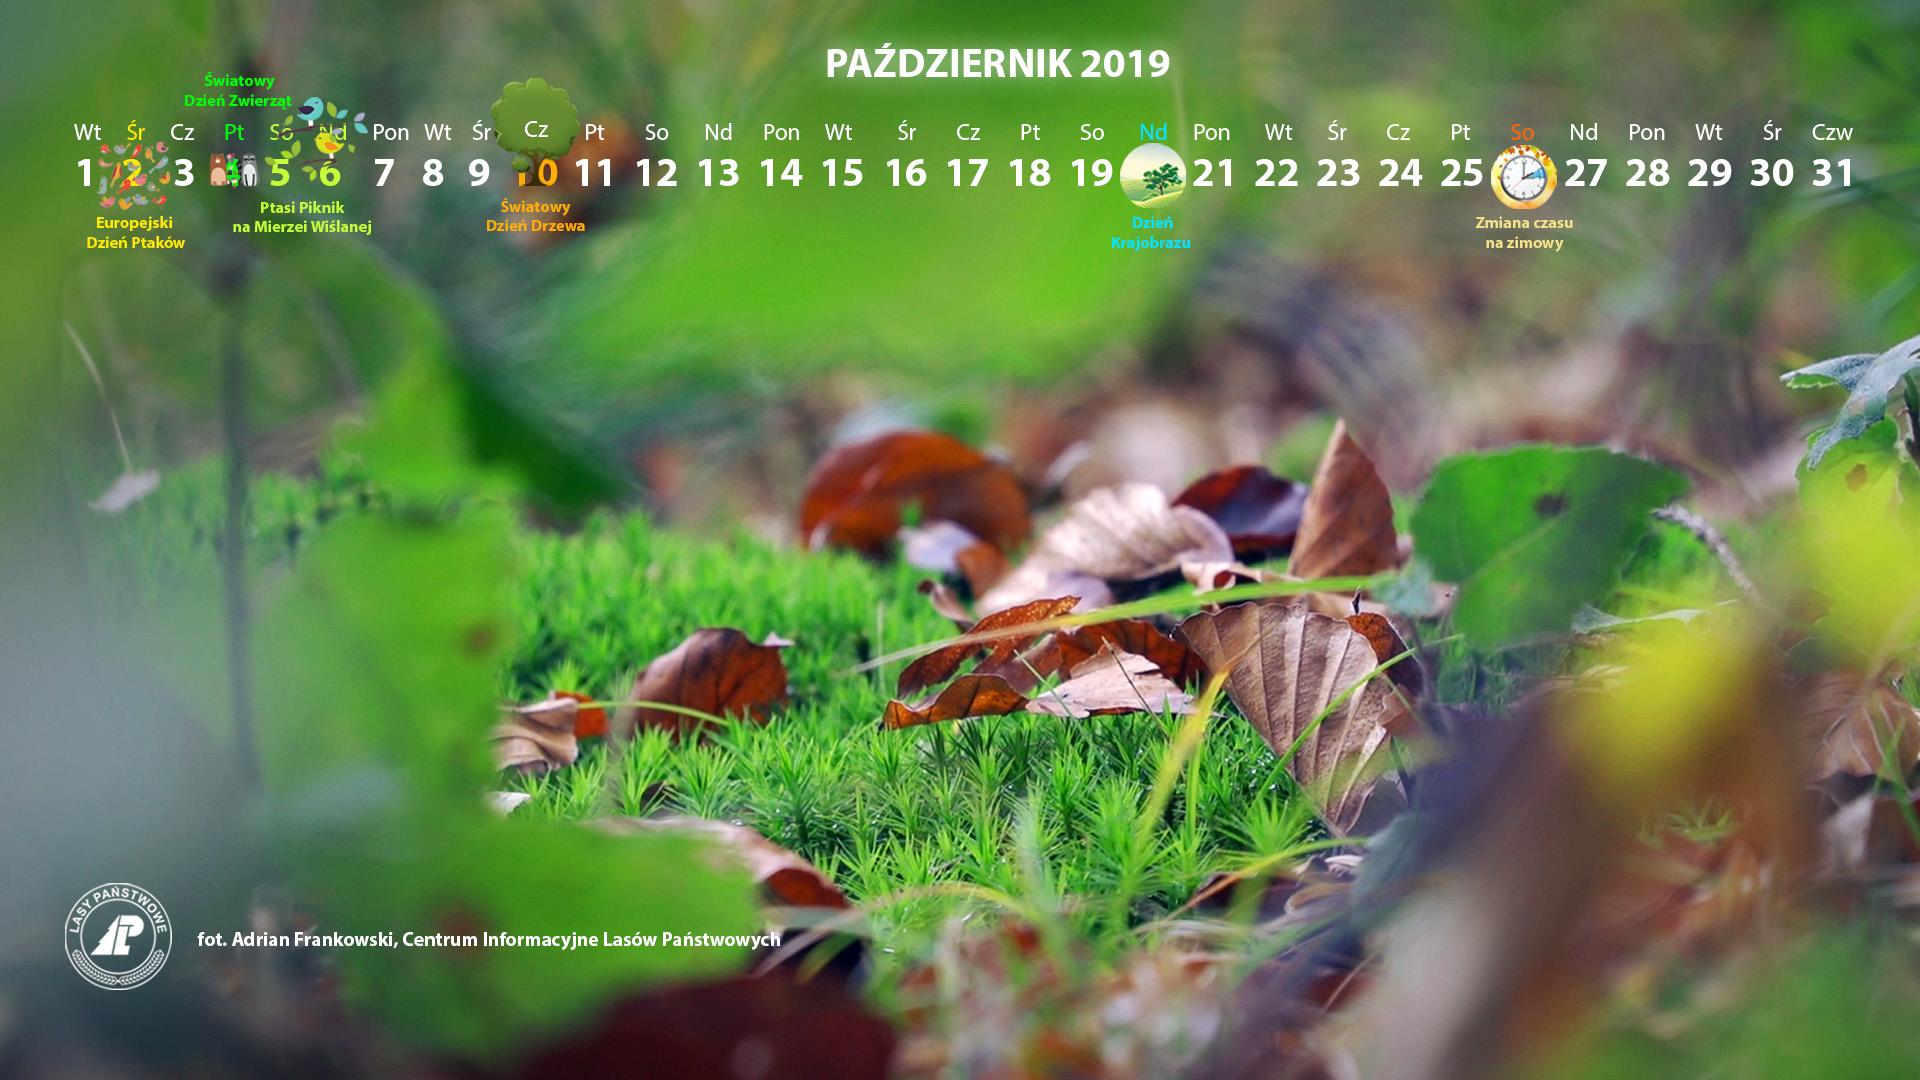 Kalendarz_październik_2019_1920x1080[1].jpg